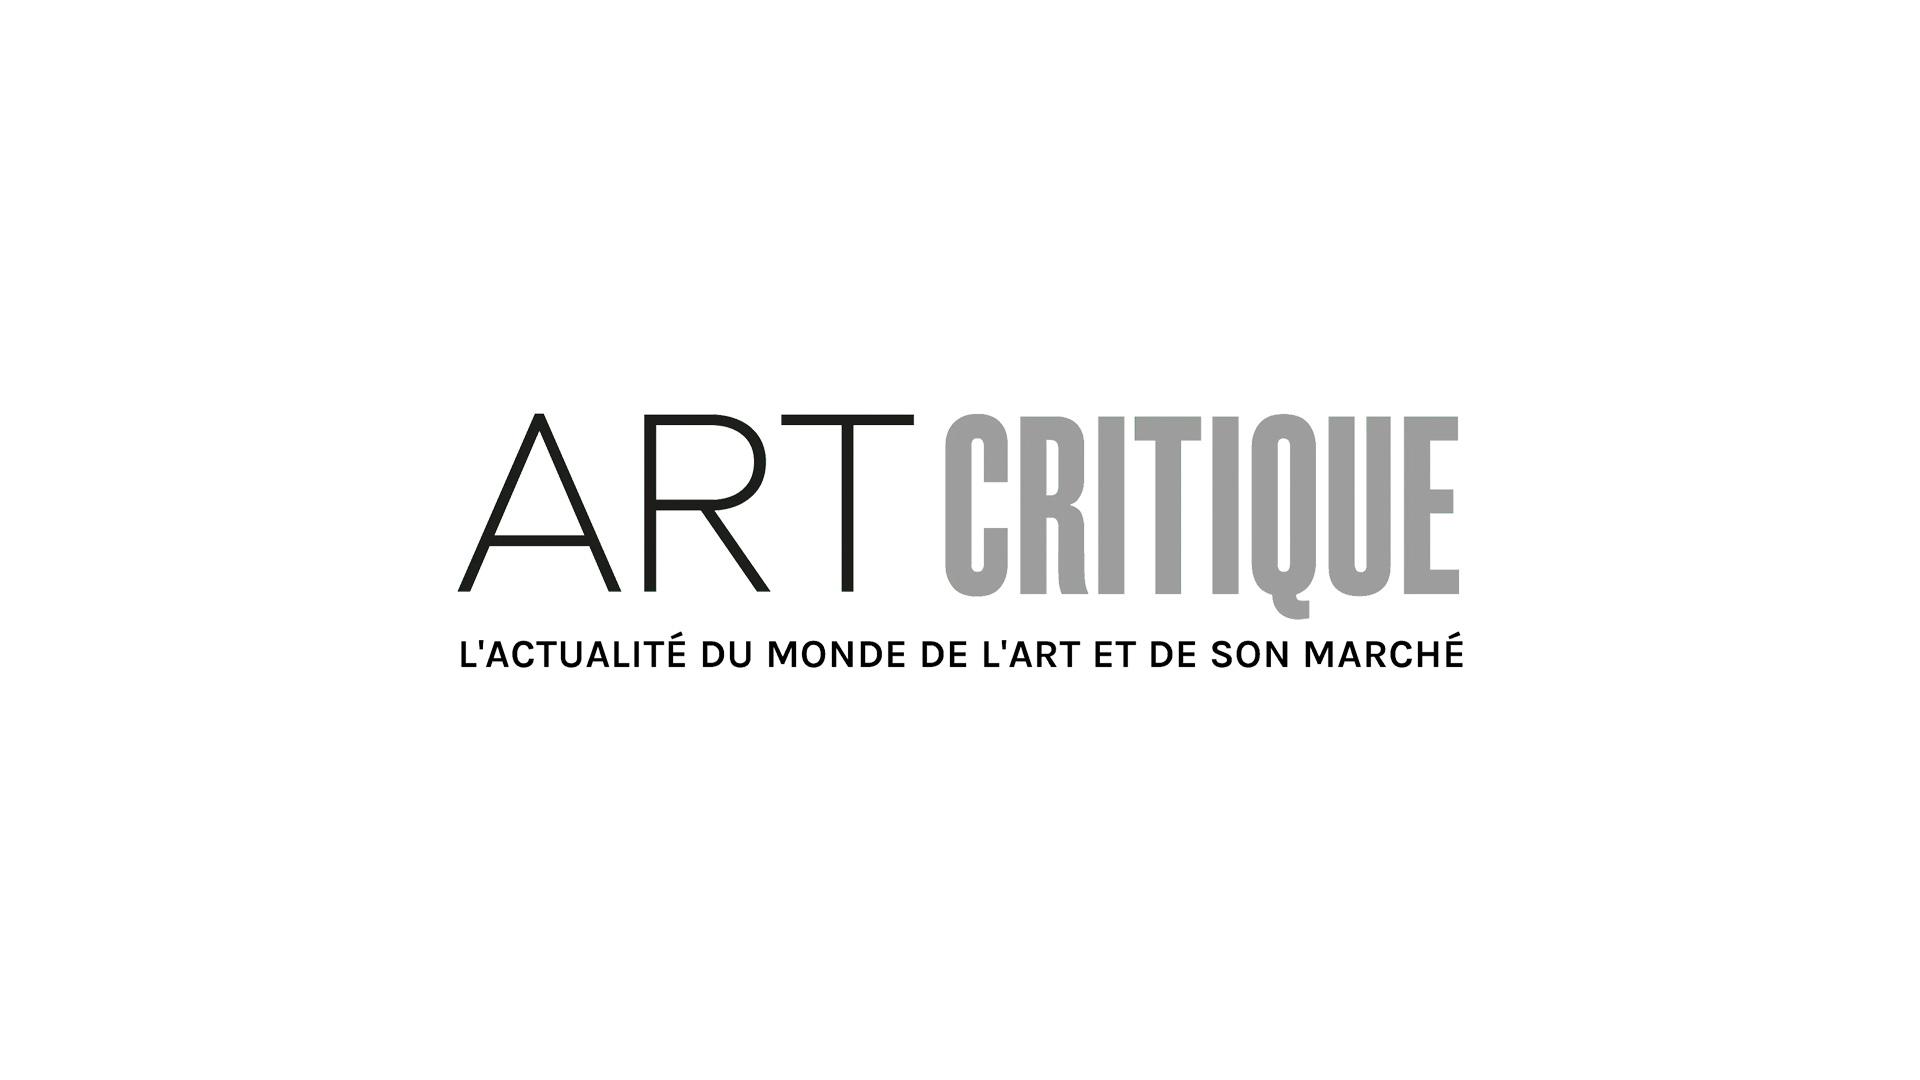 Community group opposes museum for Pulse nightclub massacre